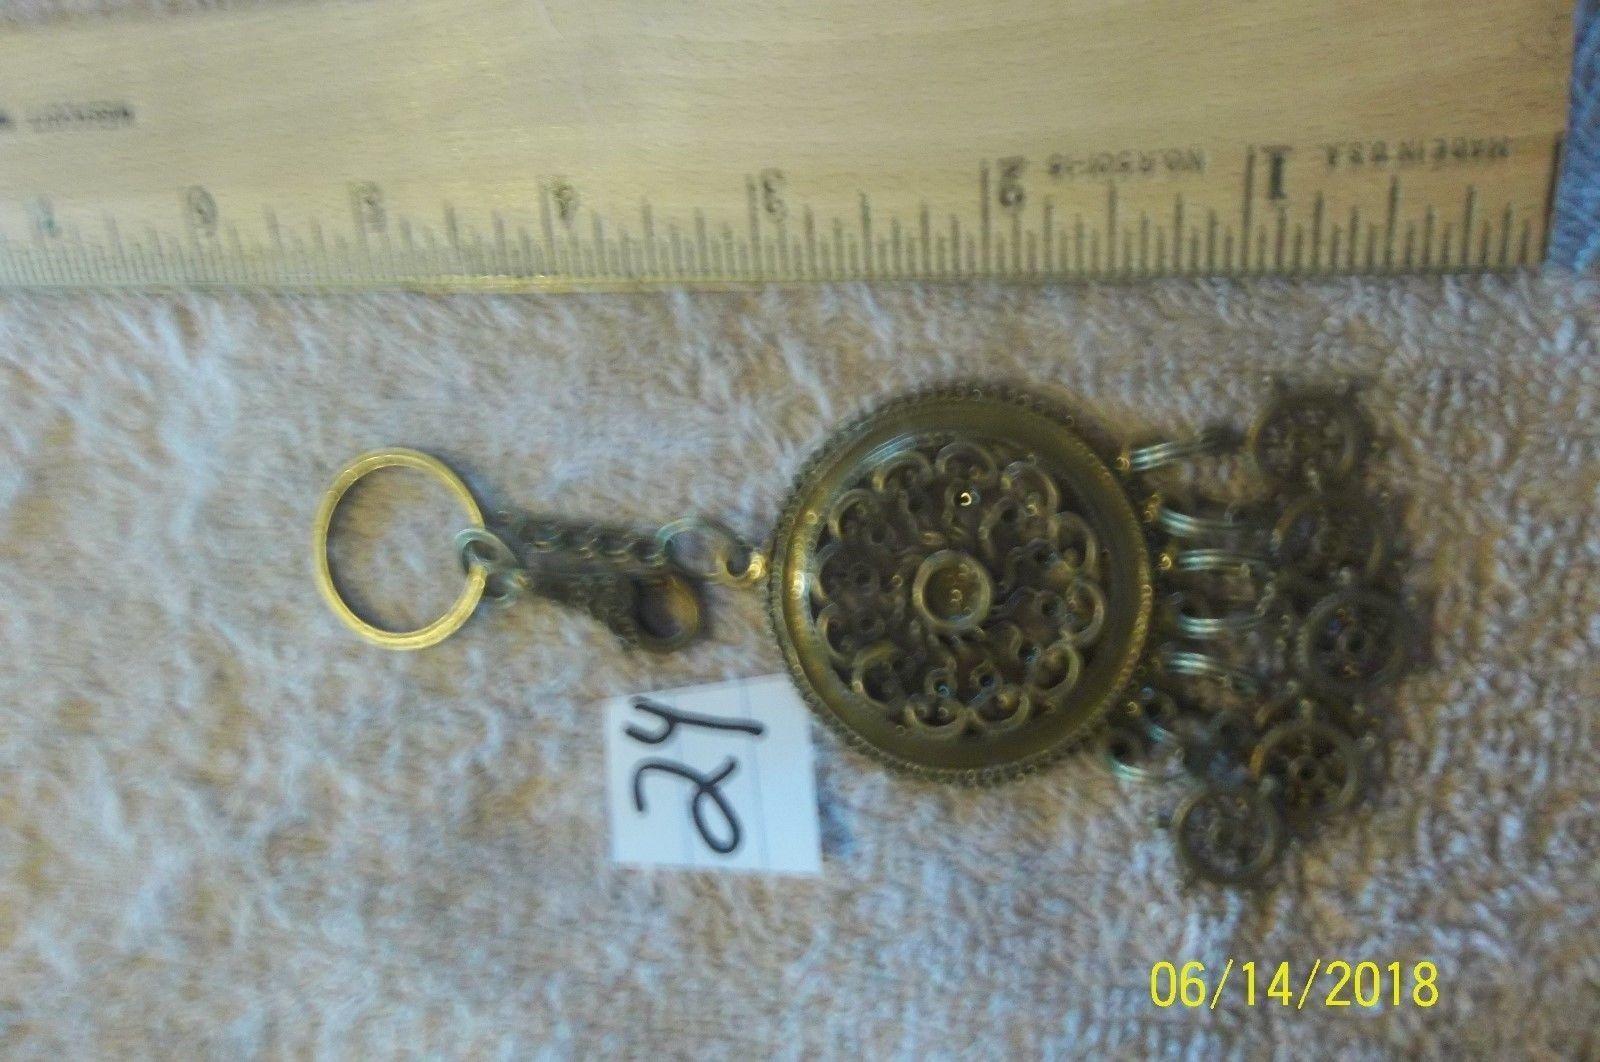 # purse jewlrey bronze color keychain backpack filigree dangle charms #24 image 2